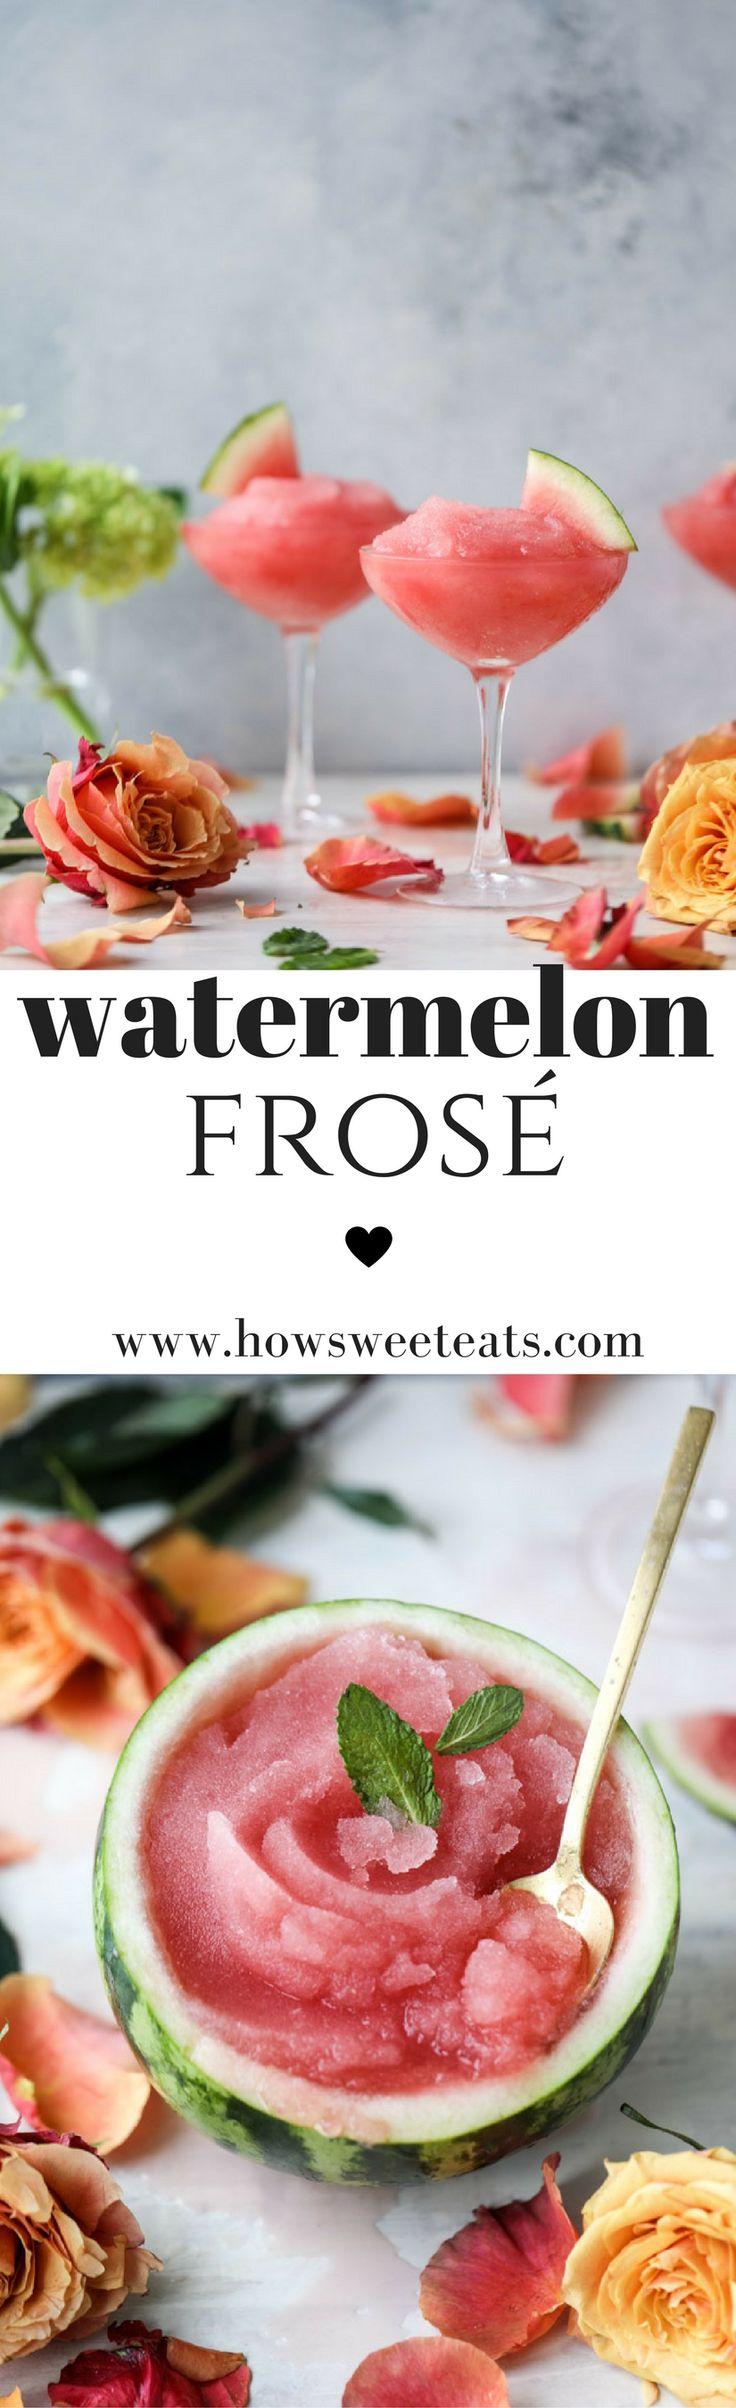 Watermelon Frosé - aka, FROZEN ROSE! your best summer cocktail. I howsweeteats.com